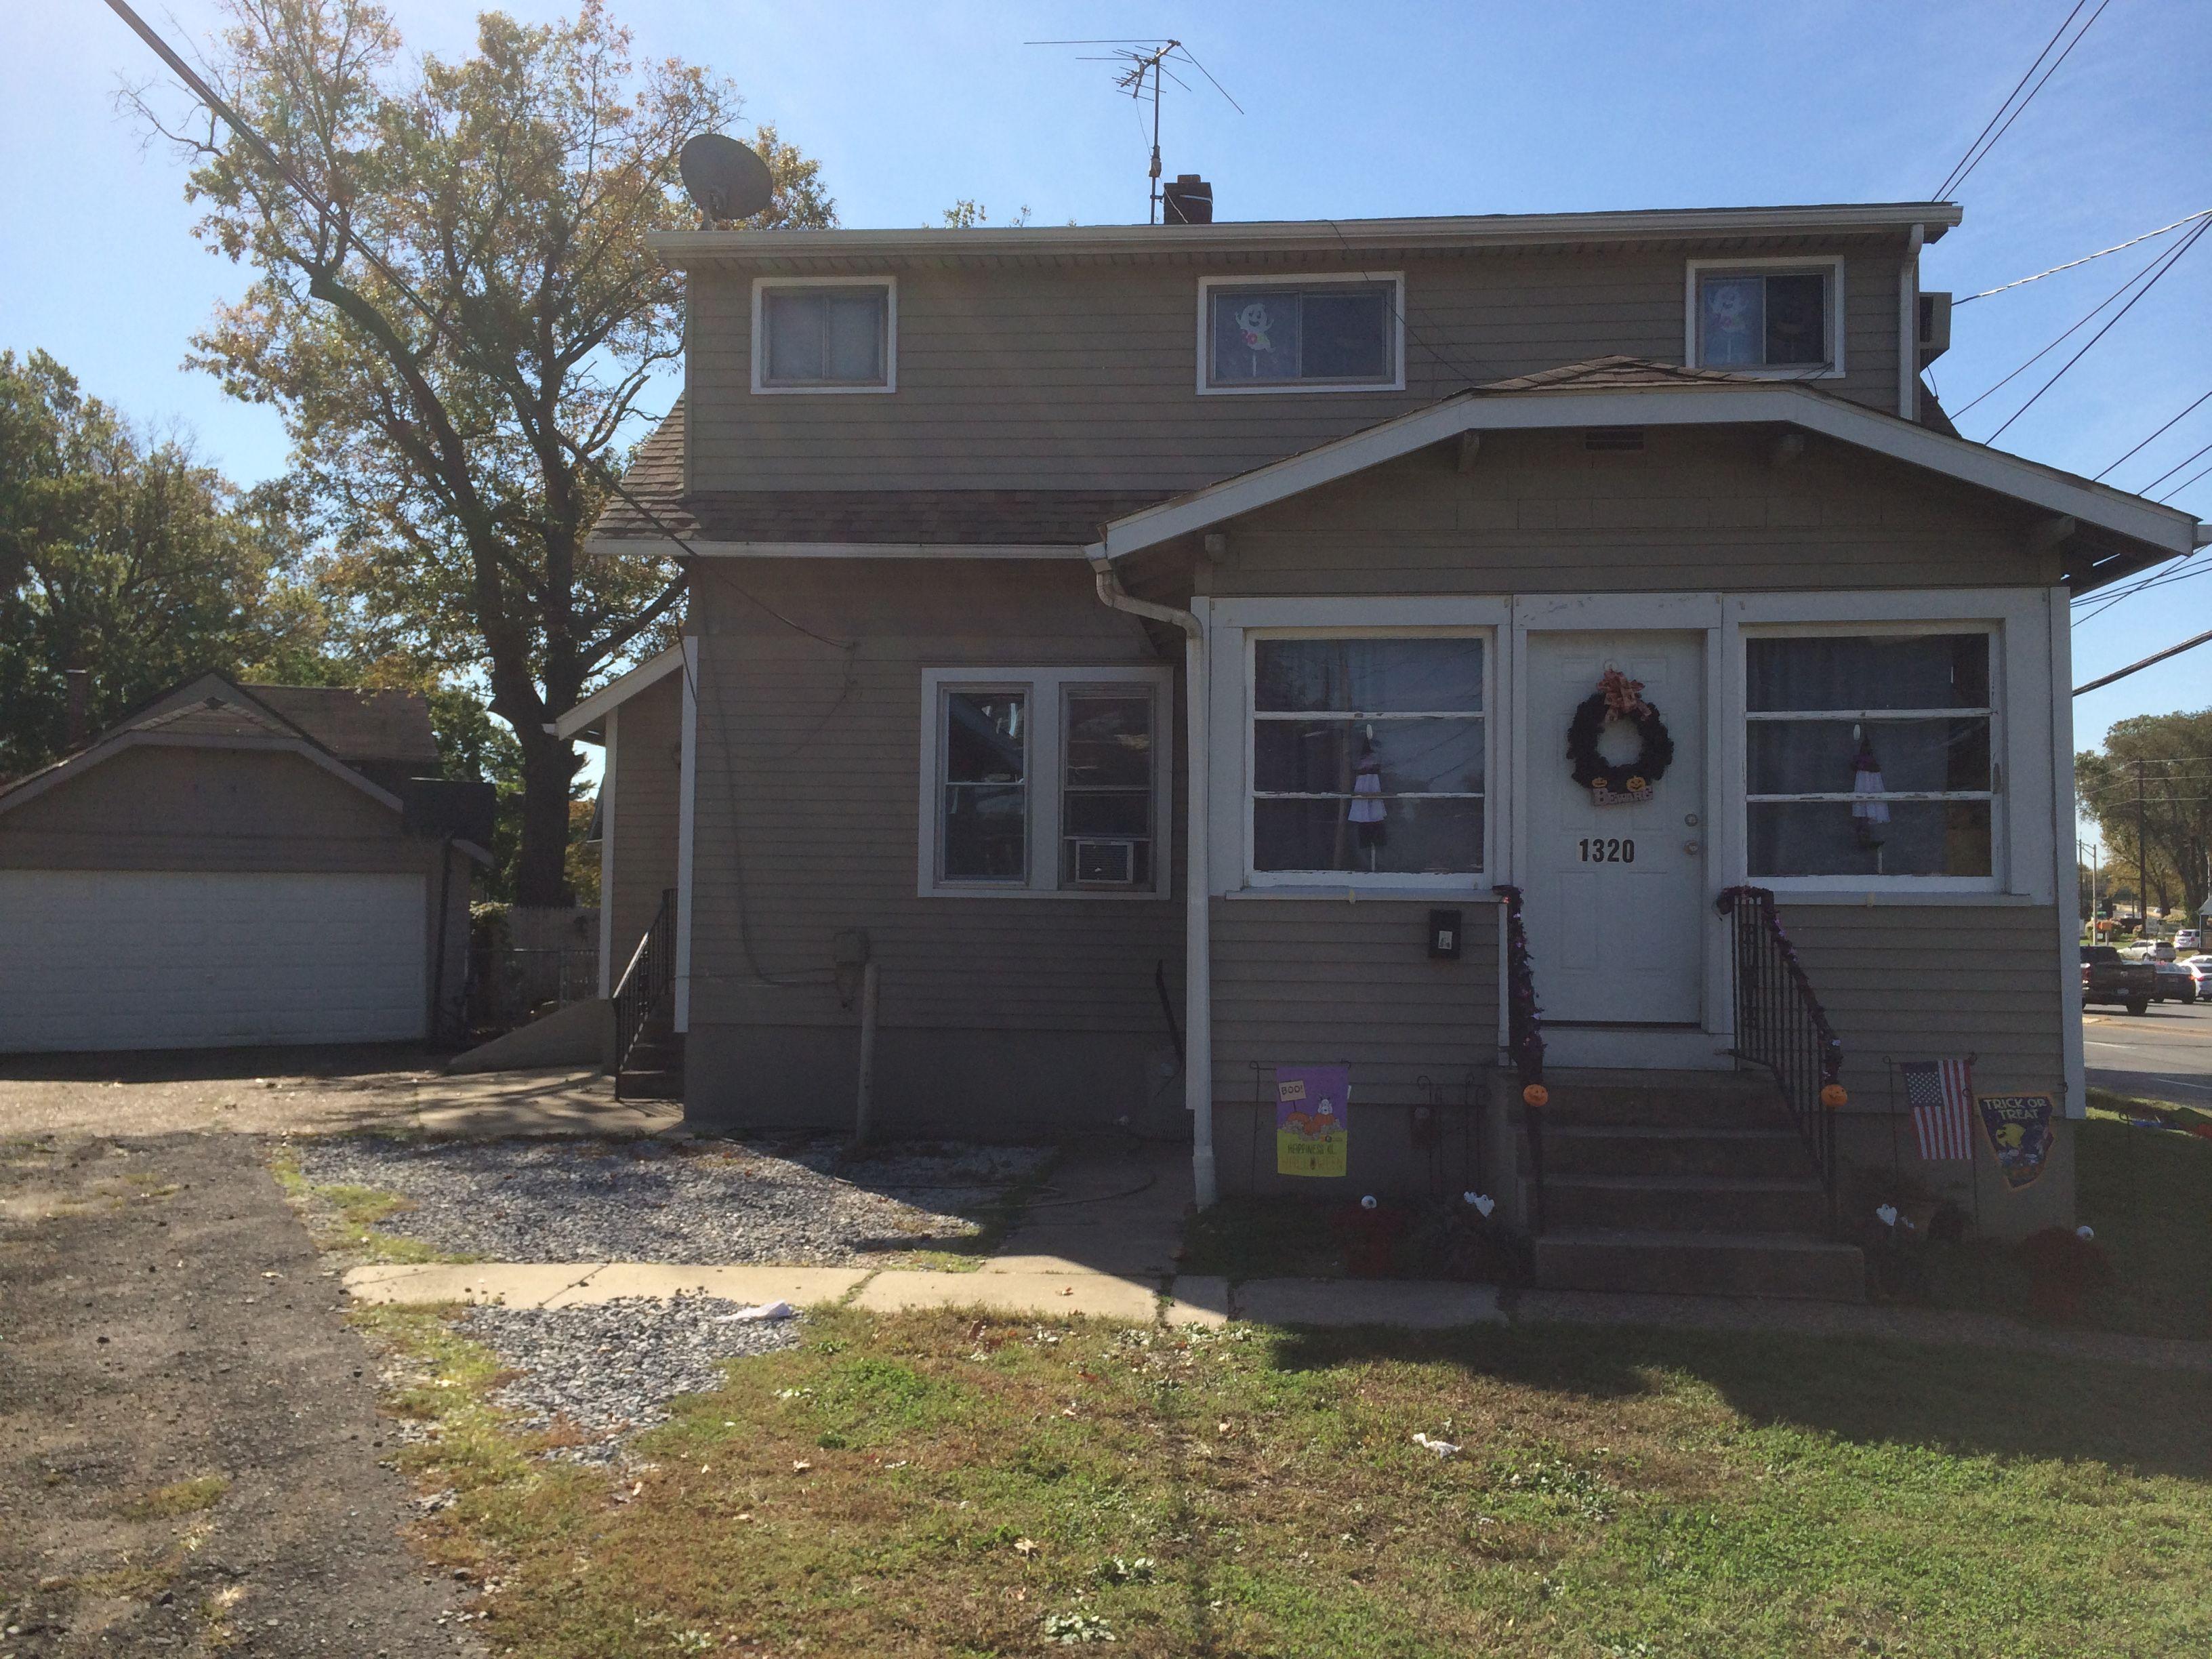 1320 Elm Ave (Image - 1)